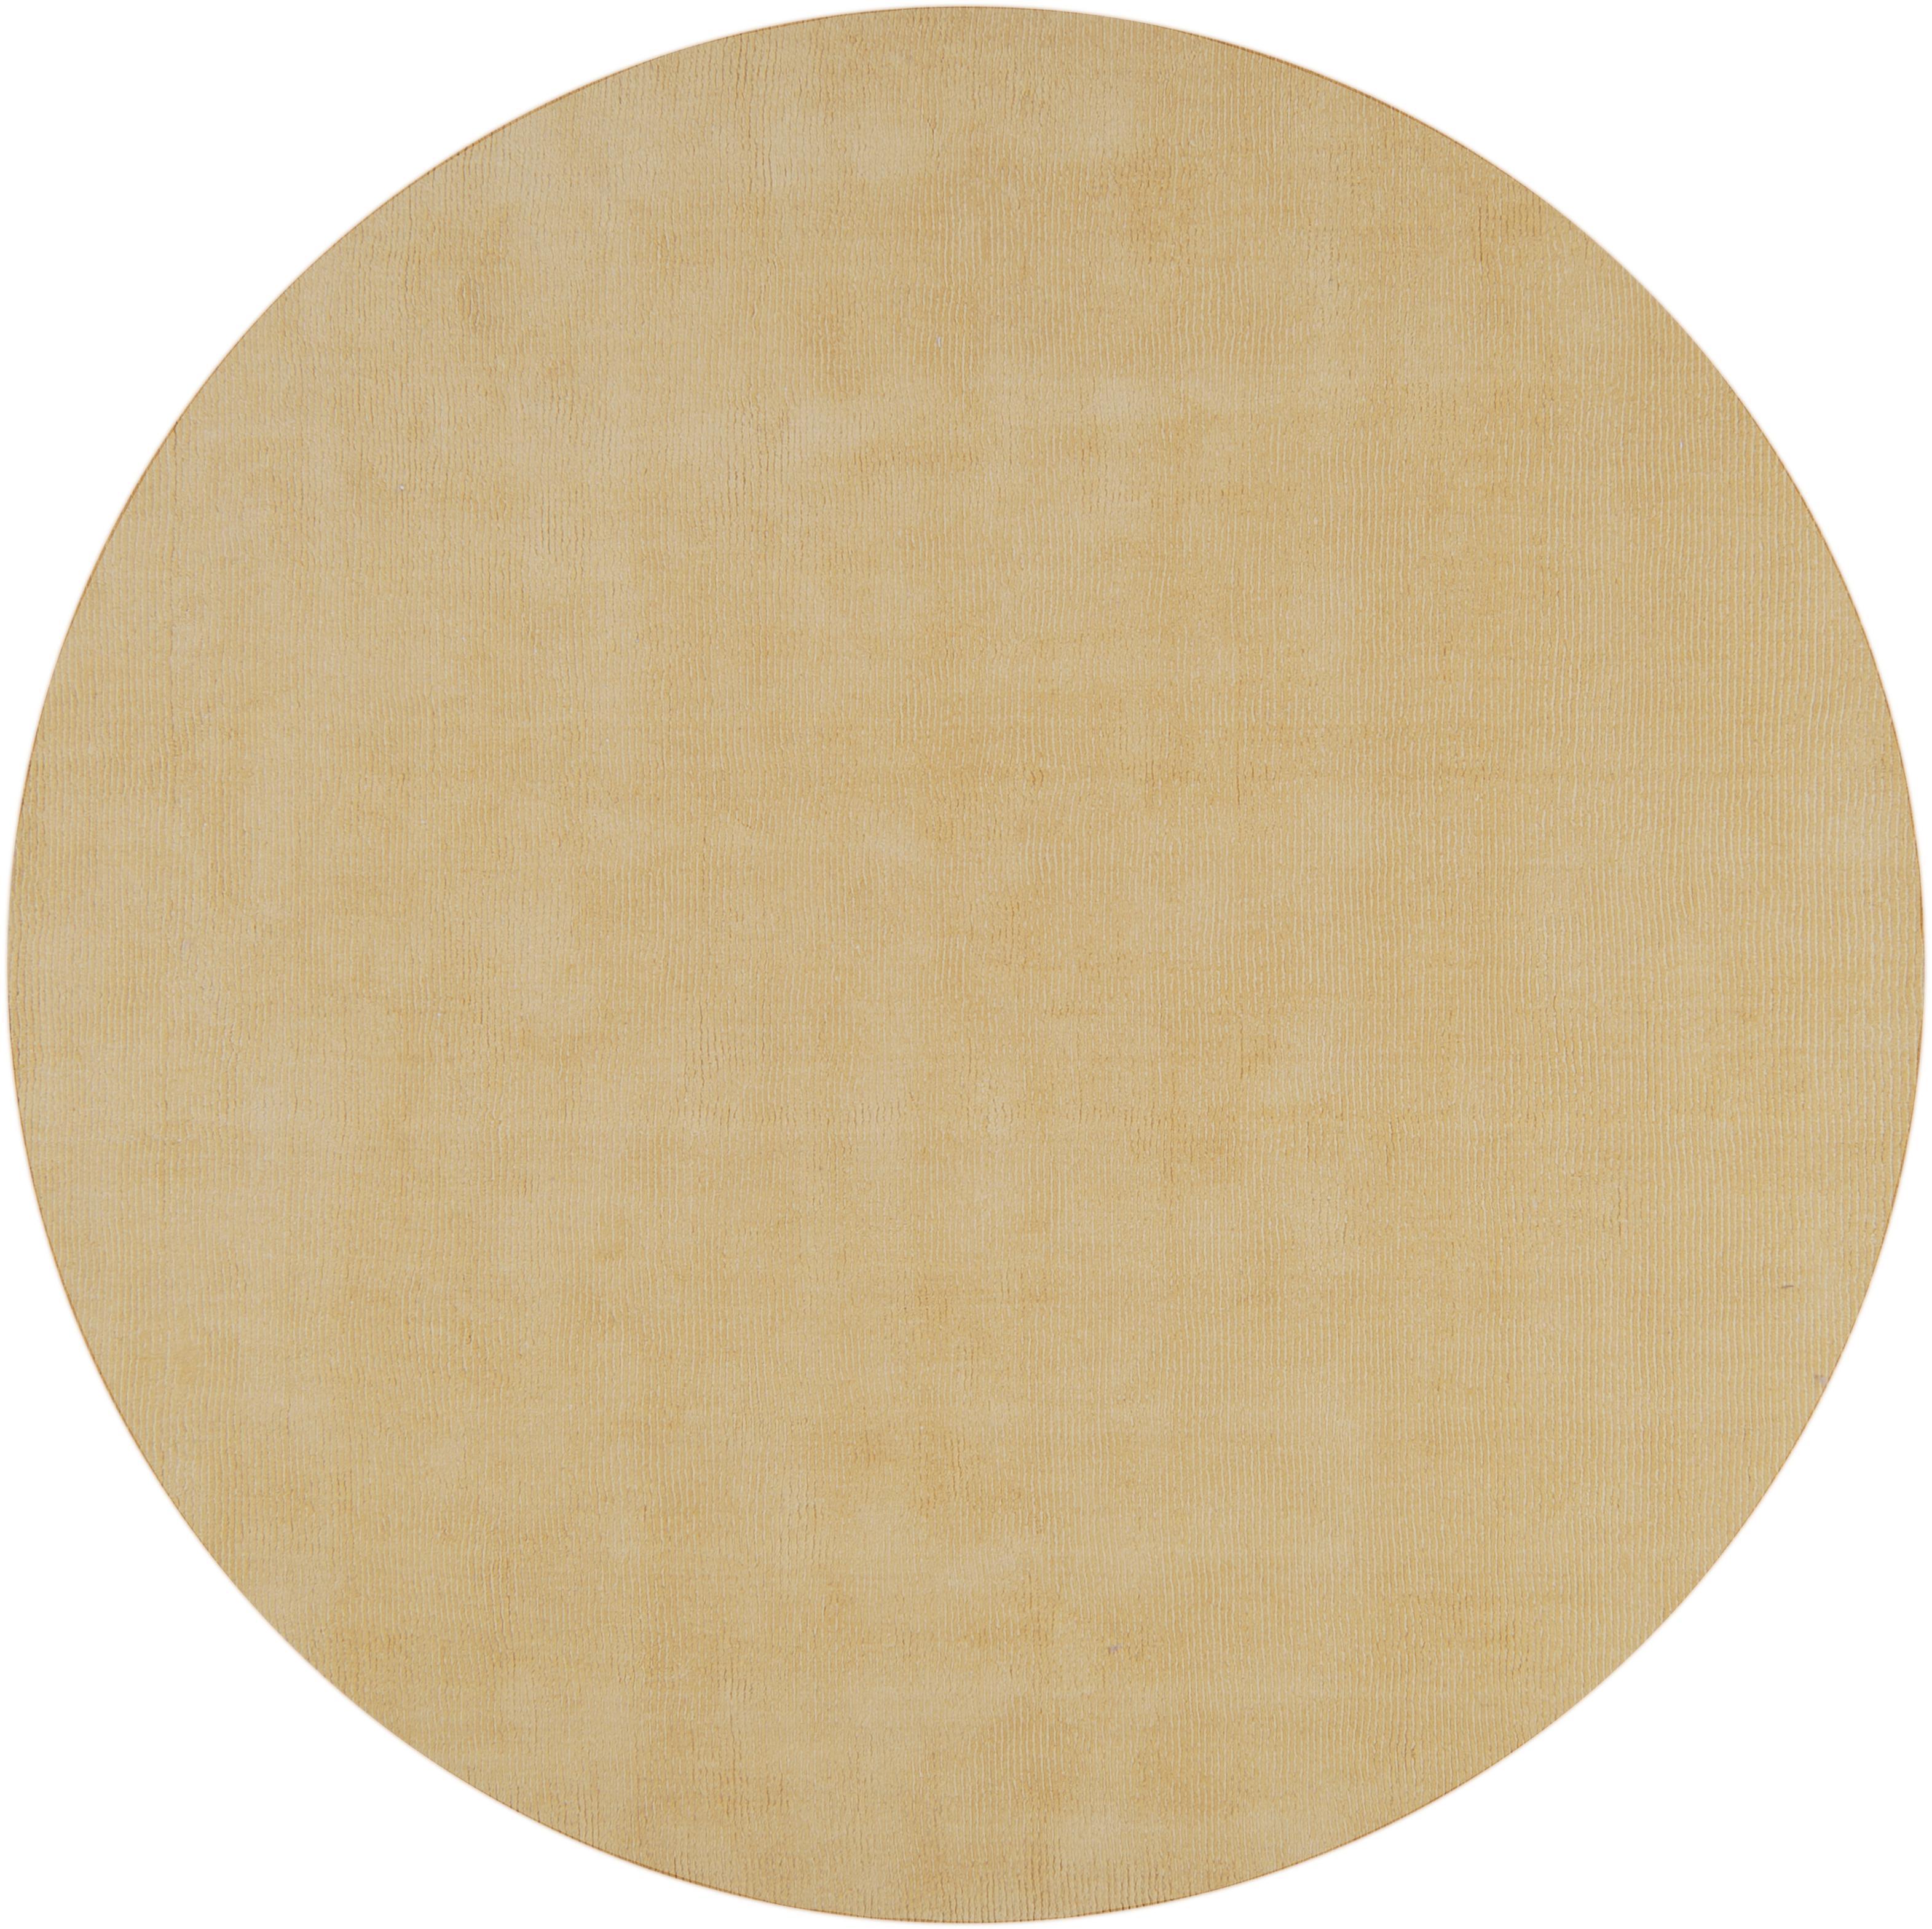 Surya Rugs Mystique 6' Round - Item Number: M327-6RD